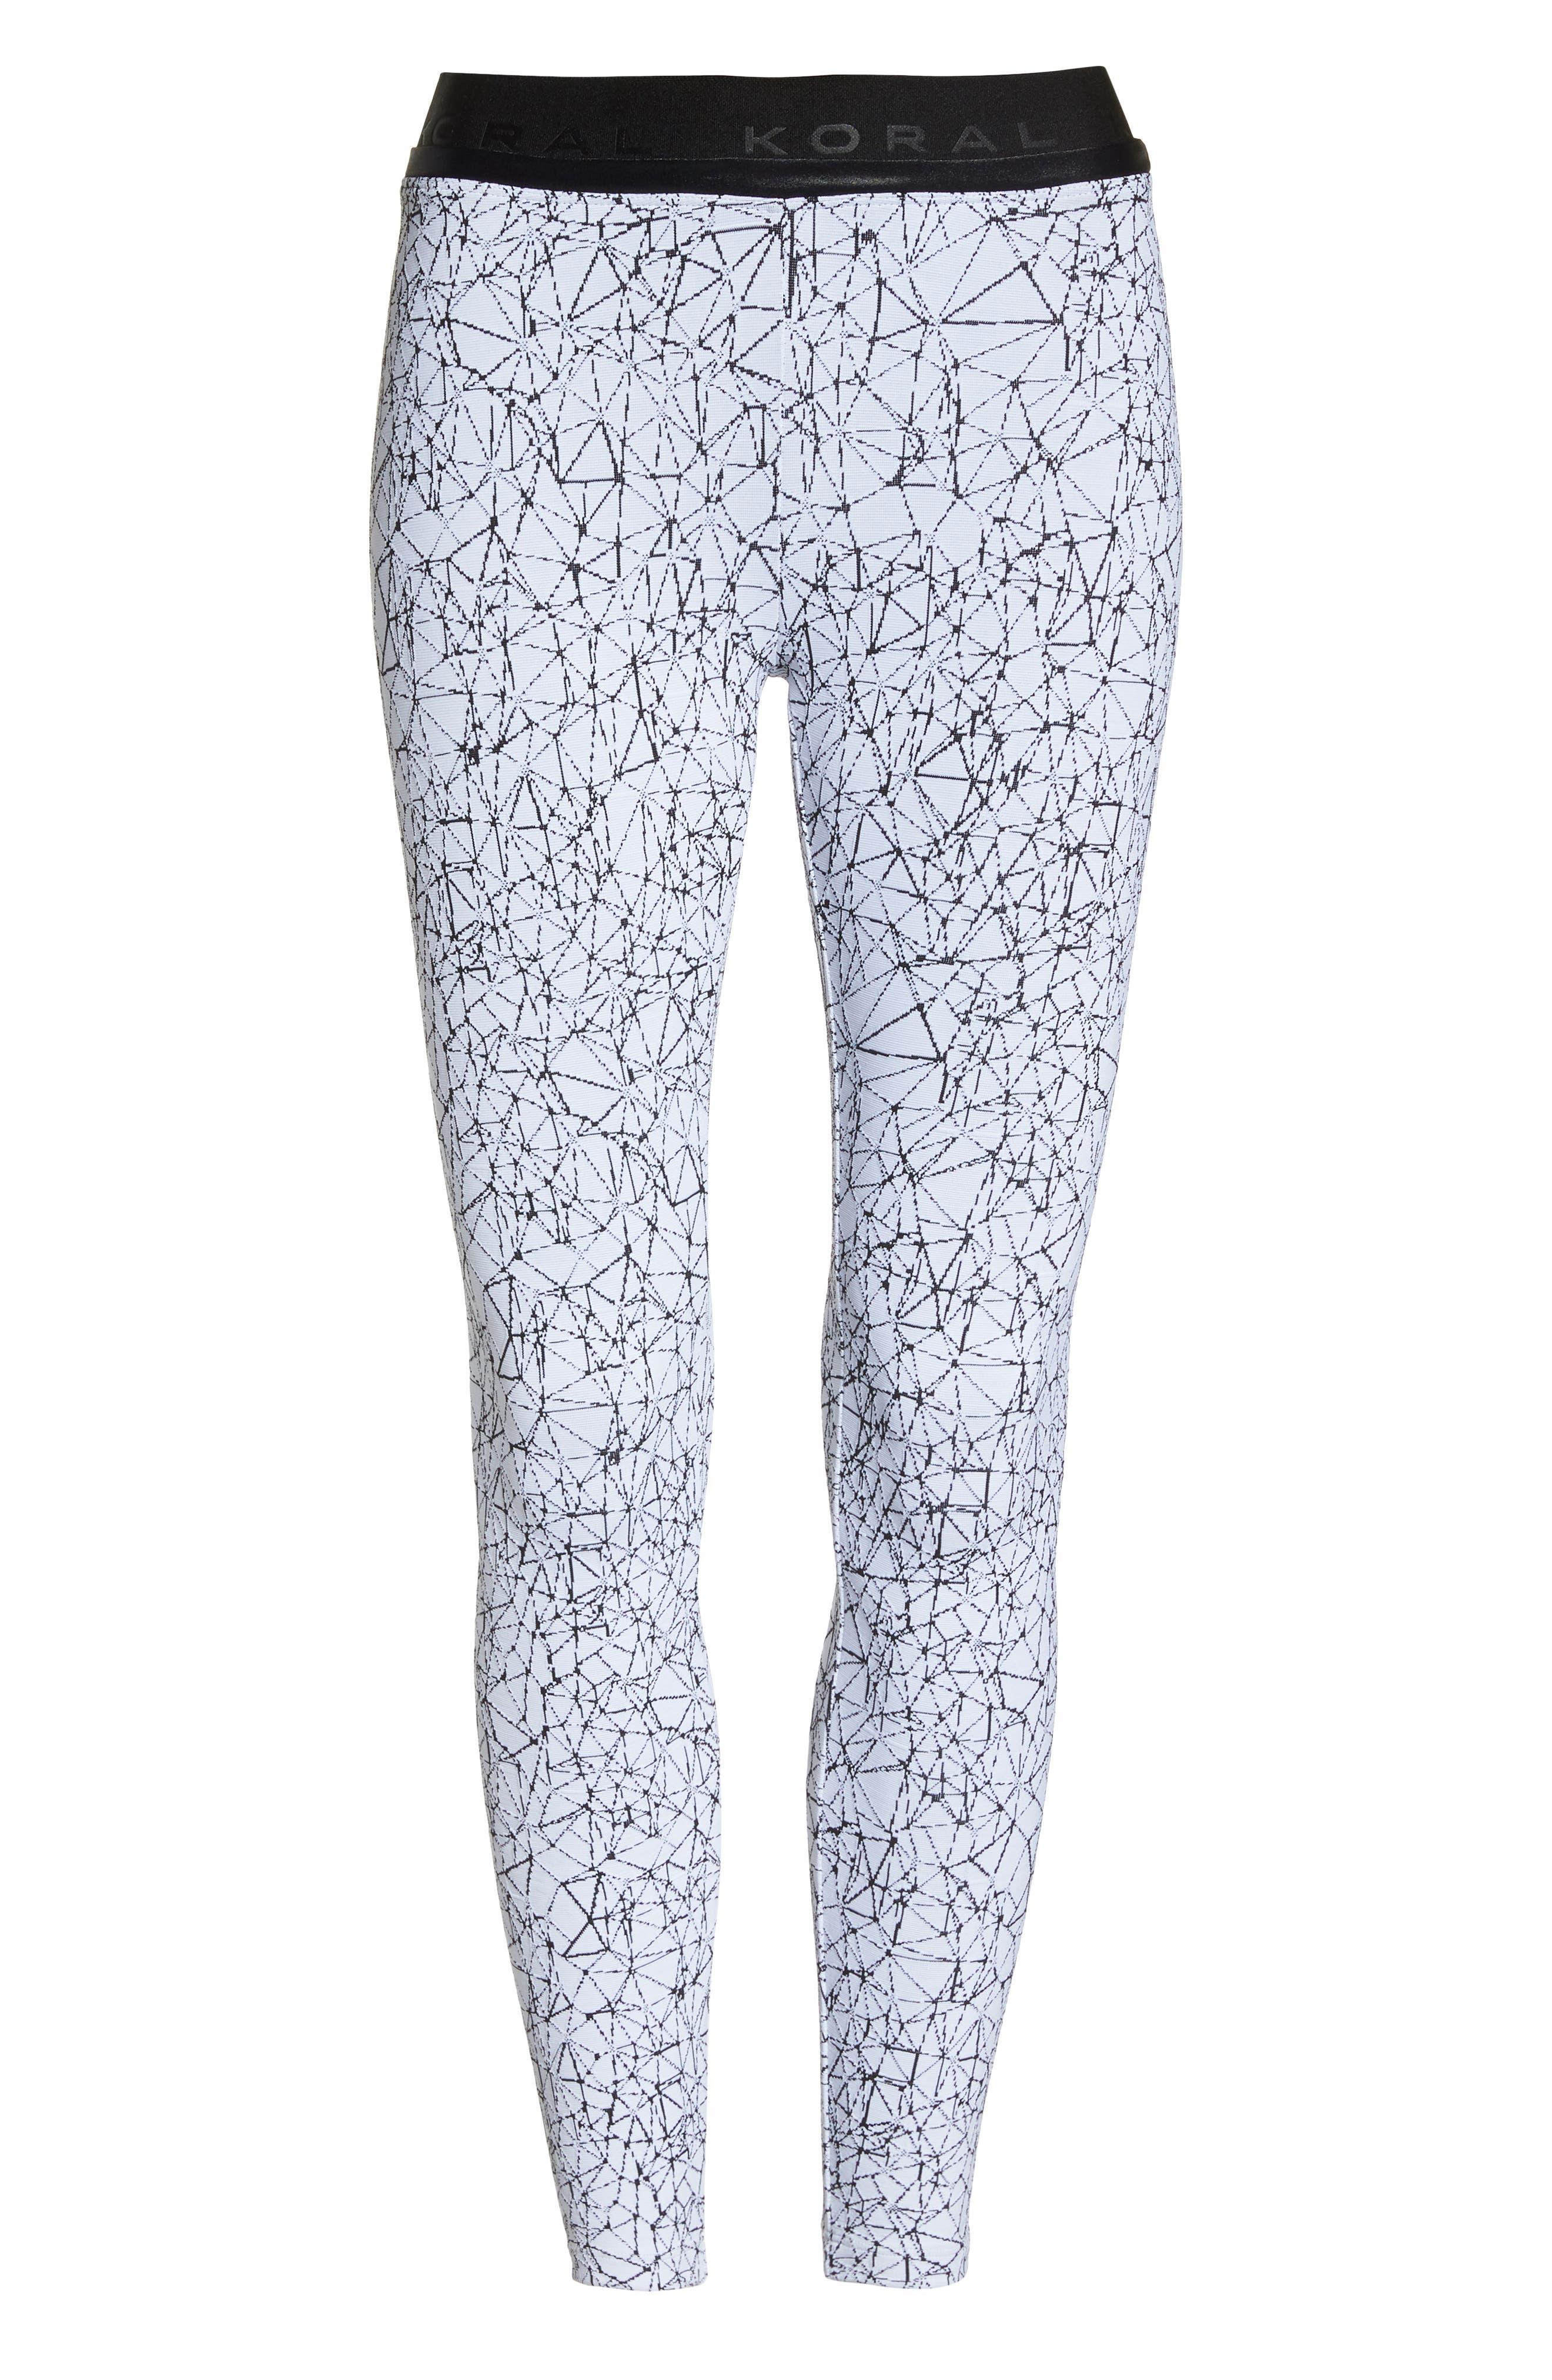 Molecular Sloane High Waist Leggings,                             Alternate thumbnail 7, color,                             Molecular White/ Black